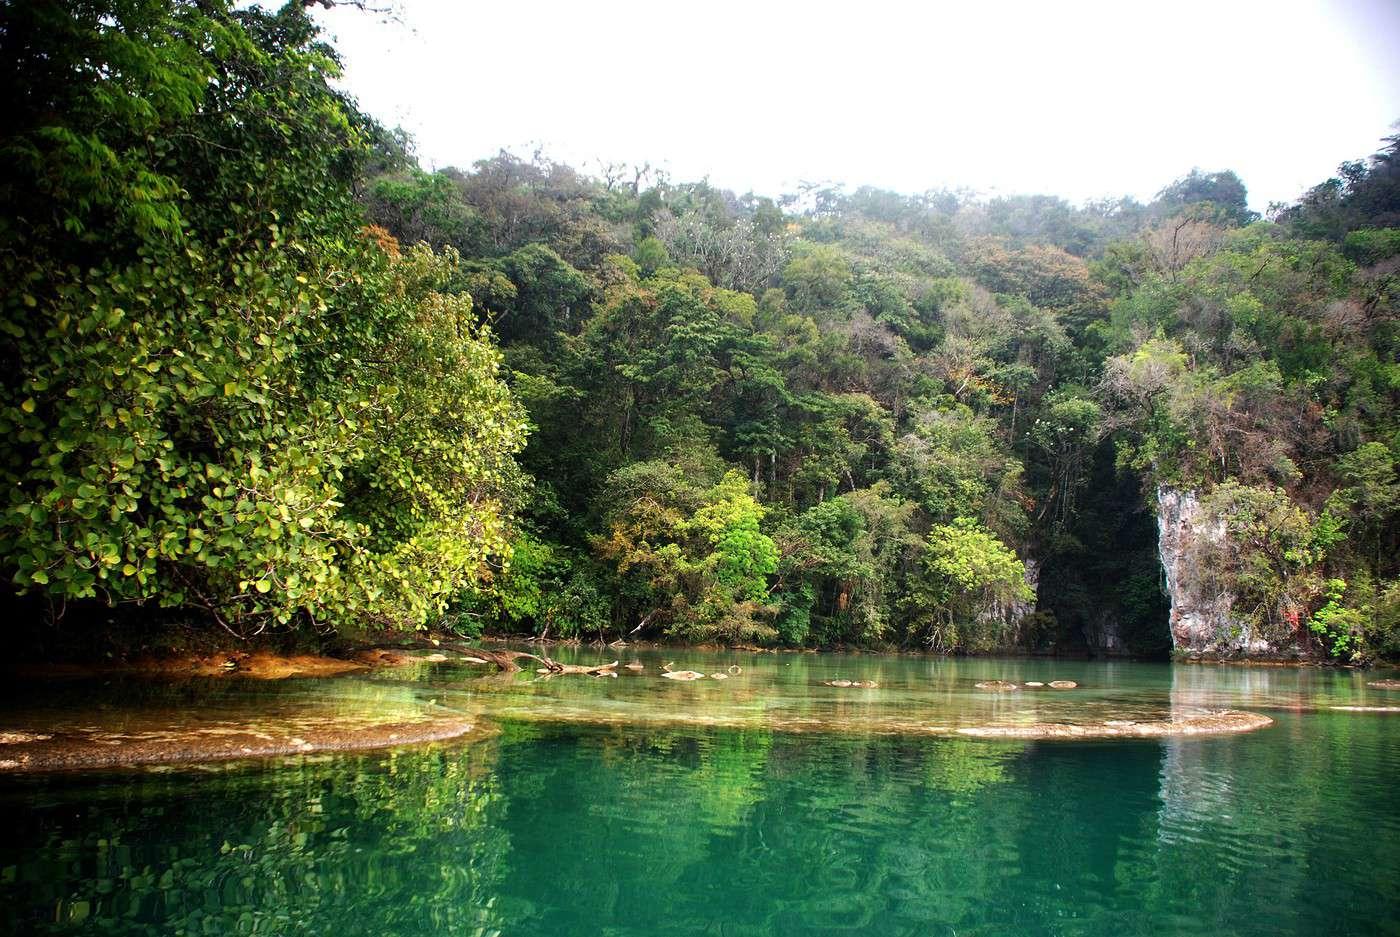 Vue des lagunes de Miramar